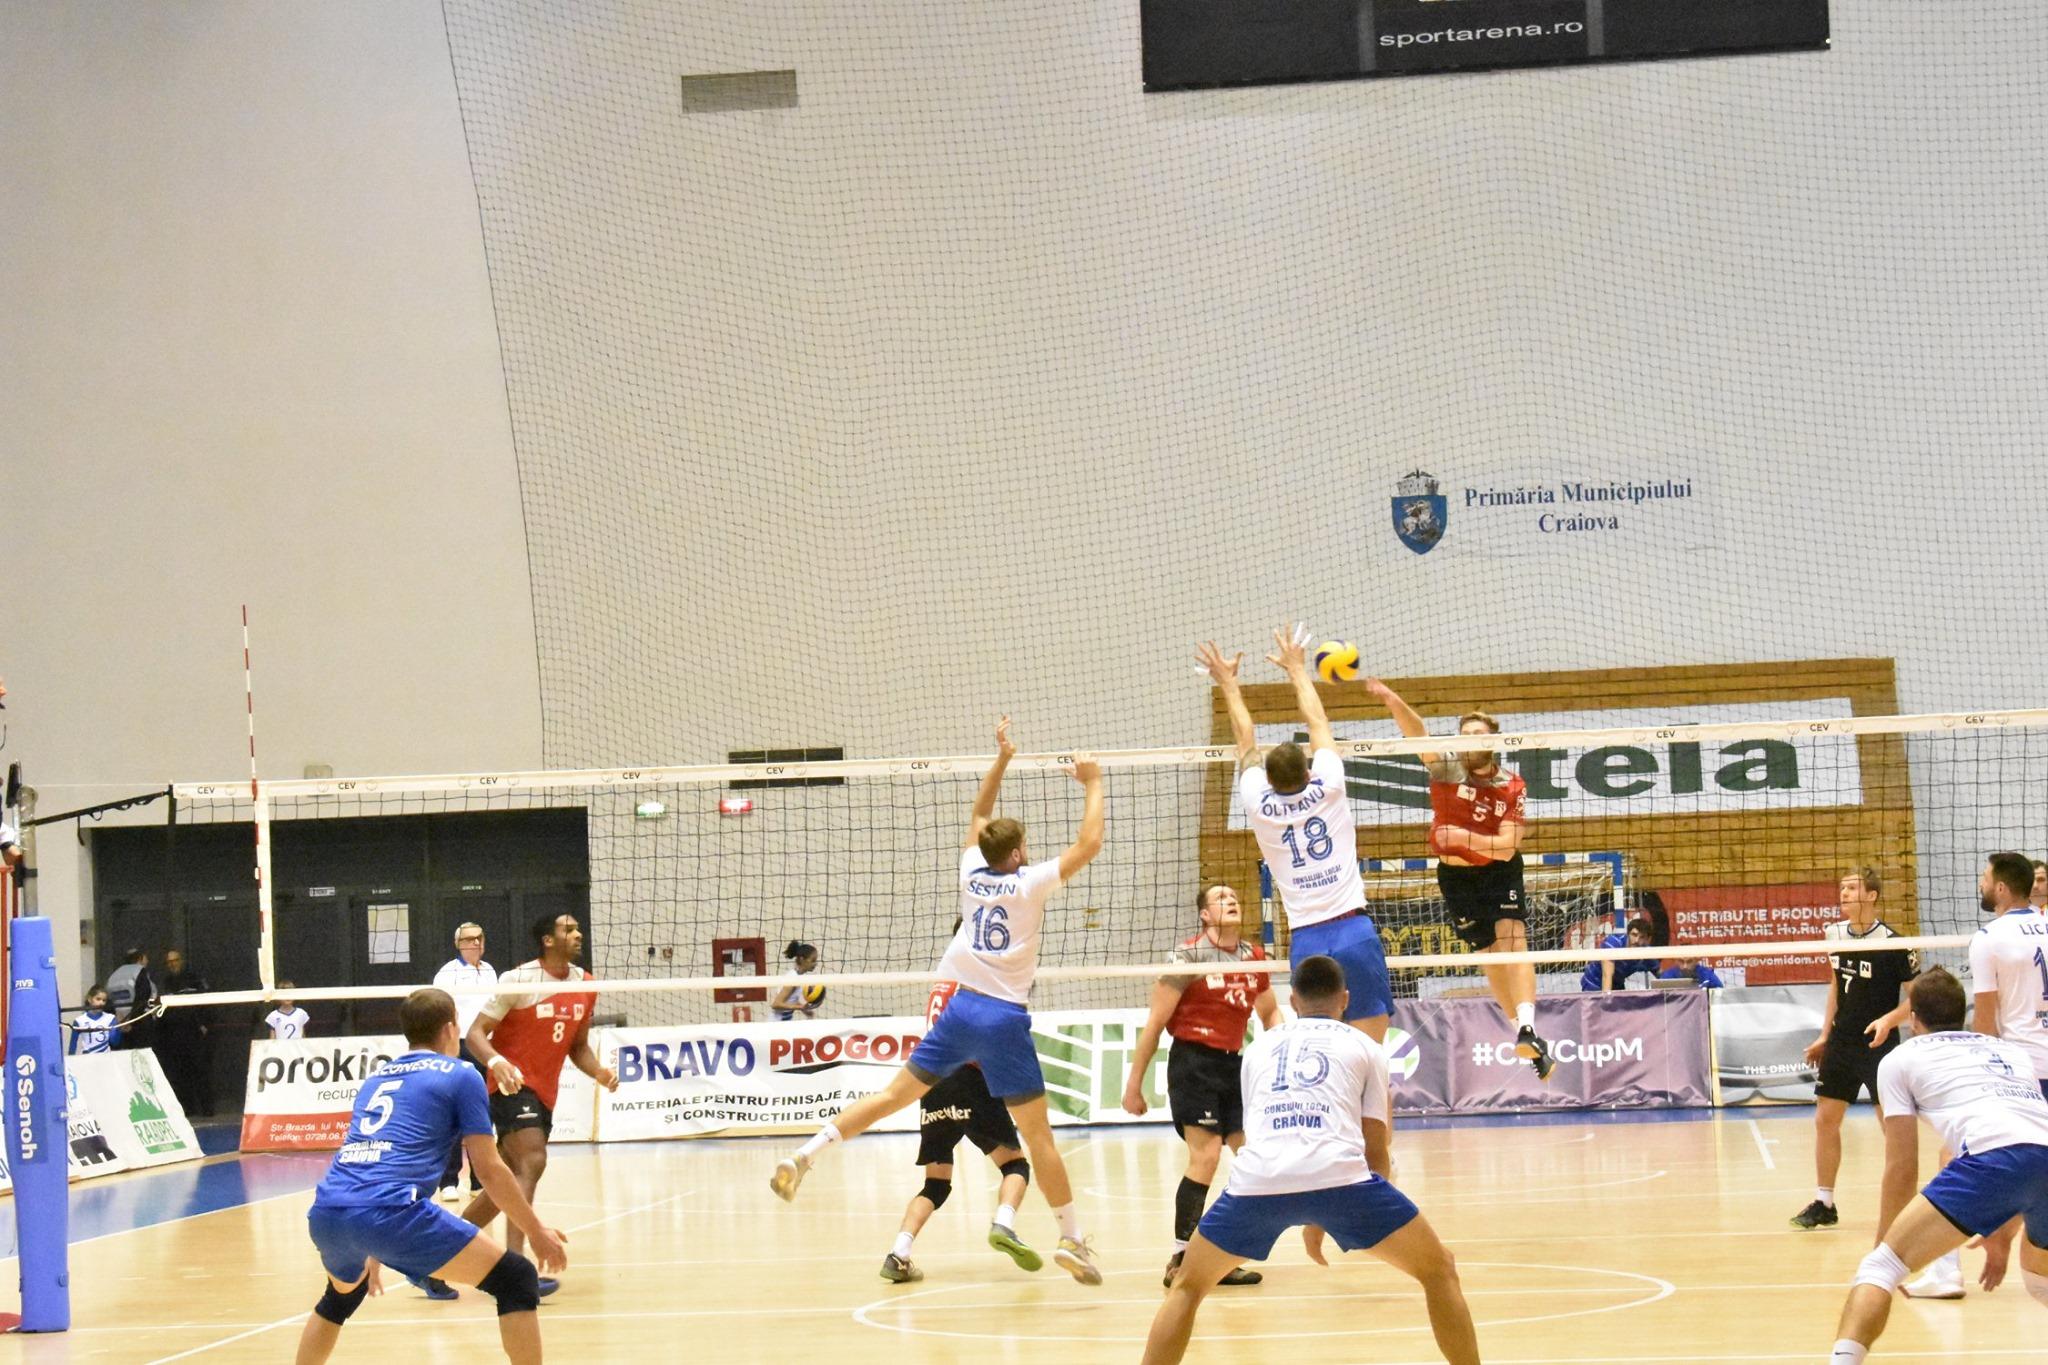 Europacup – SCM U Craiova schlug zurück